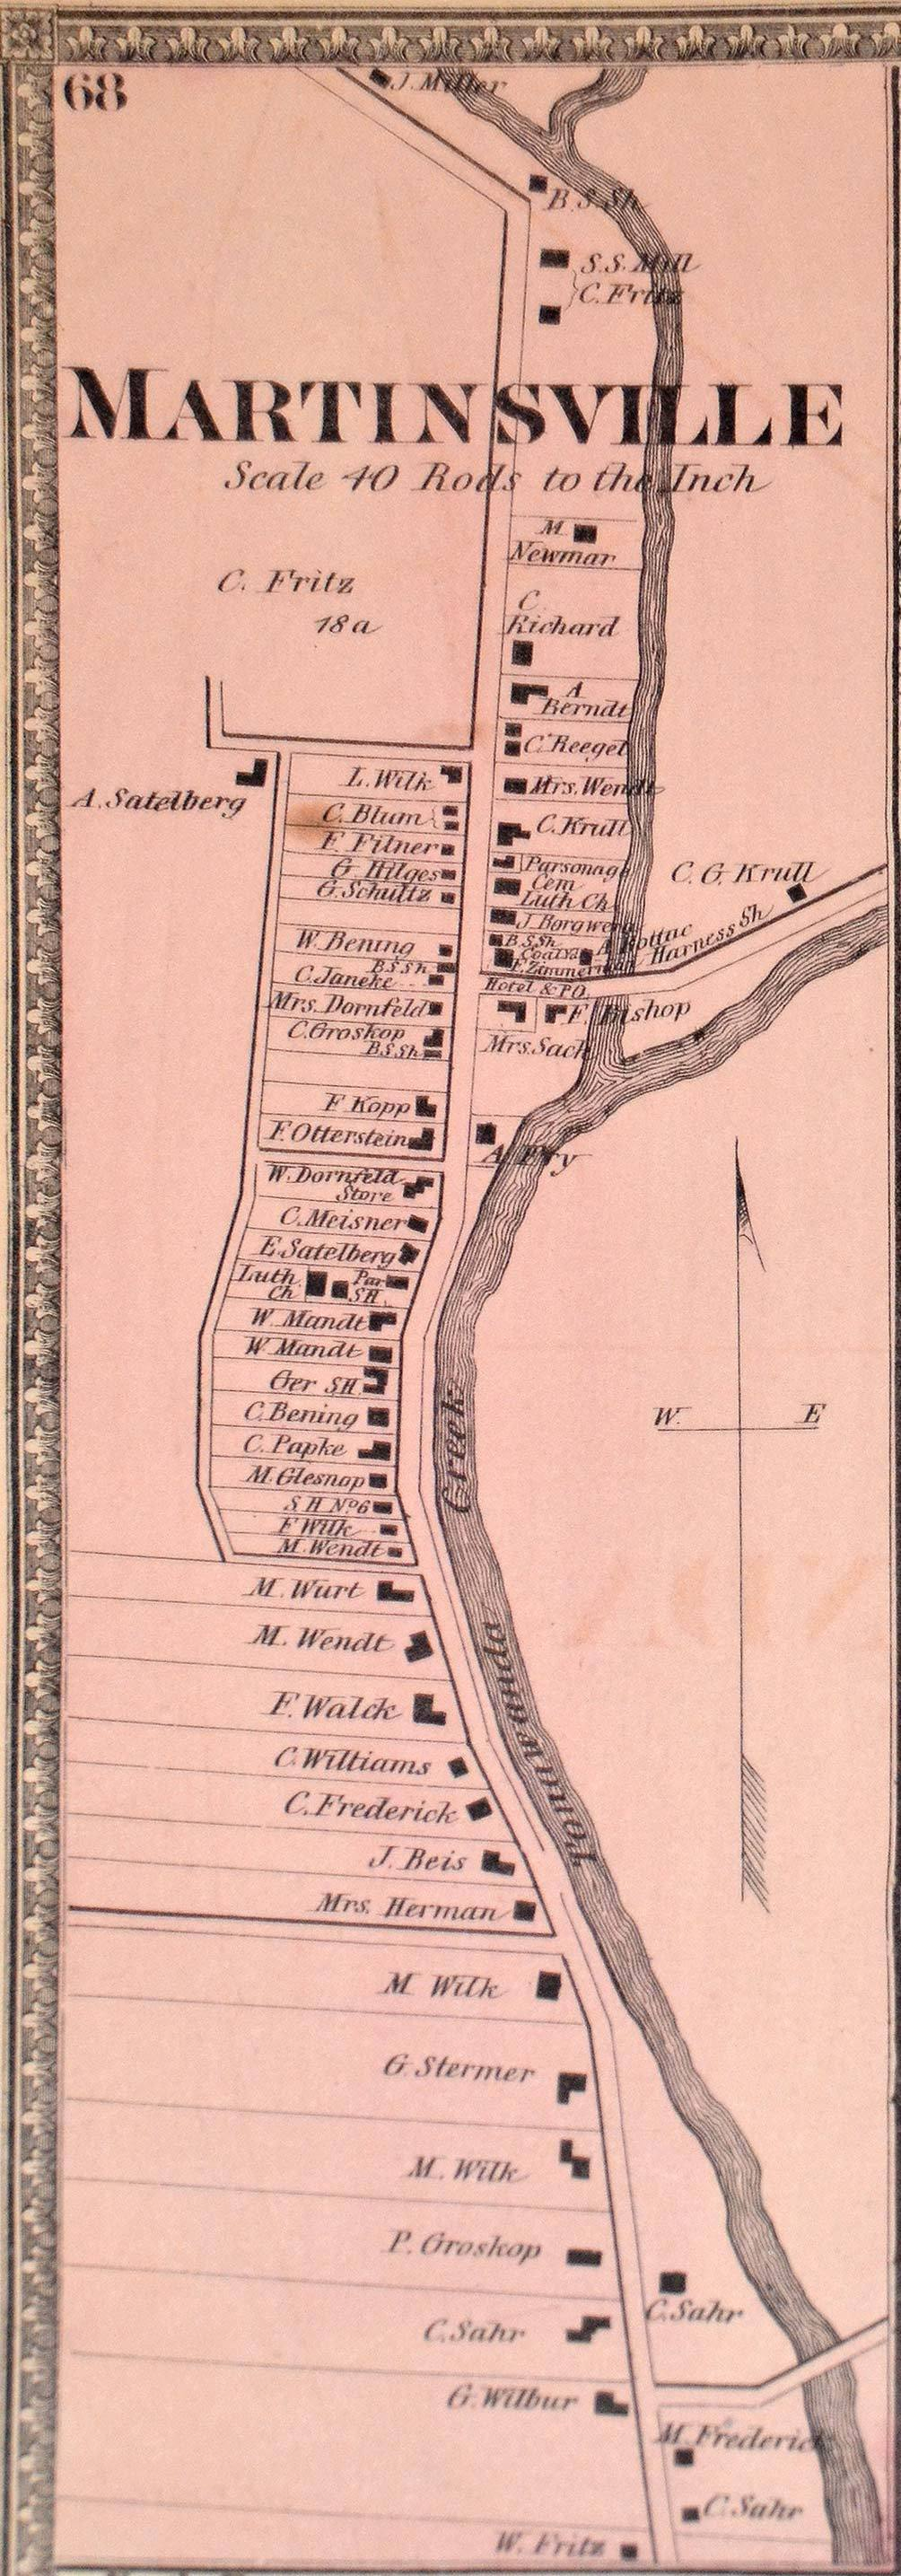 Martinsville, hi-res, inset map (1875).jpg